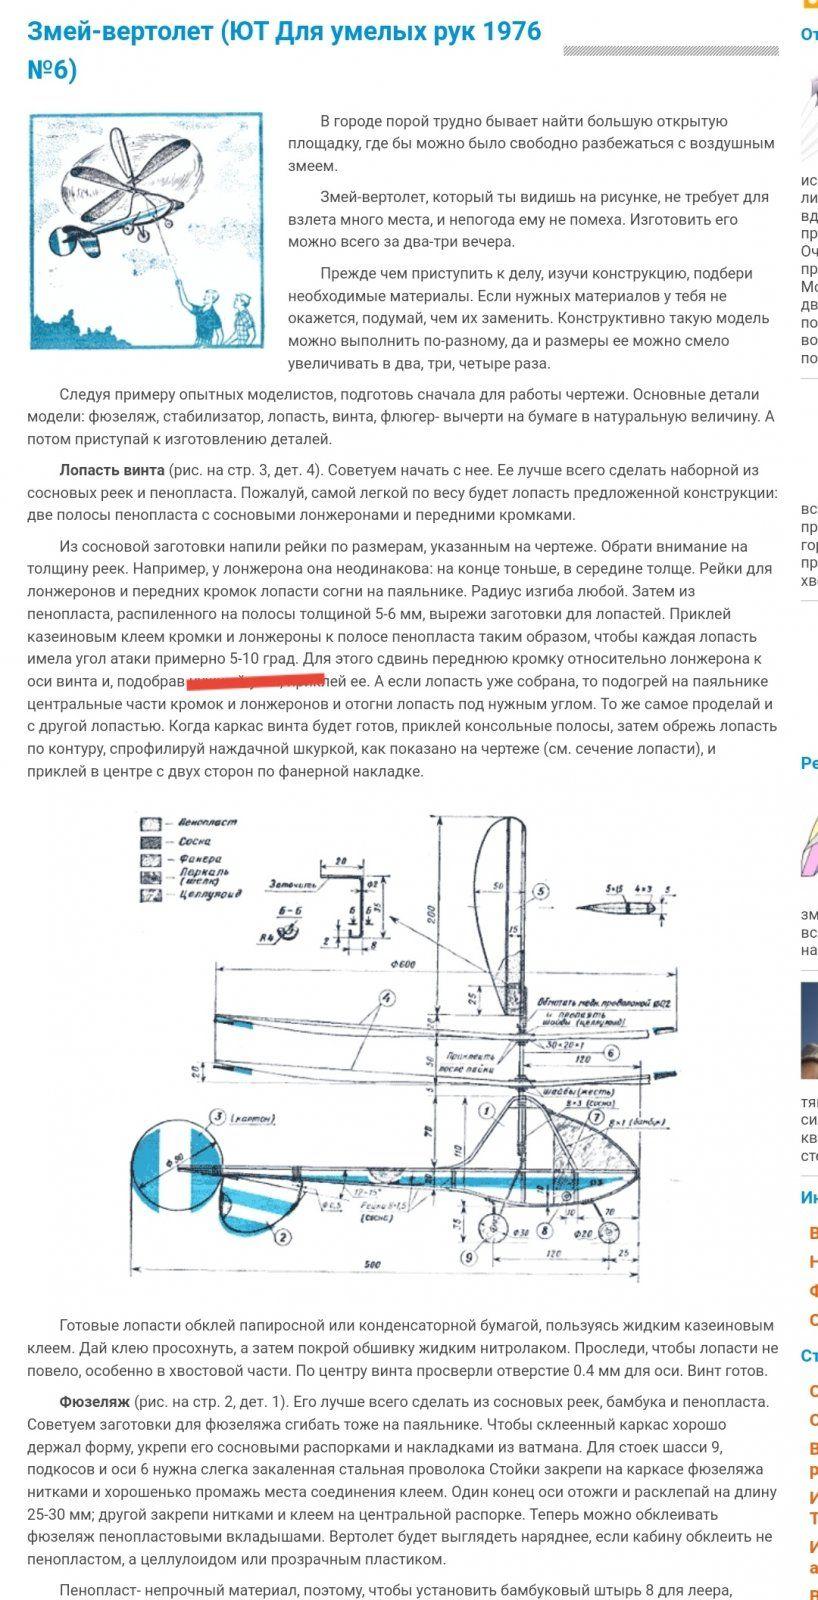 https://reaa.ru/attachments/screenshot_20210625_162040-jpg.476880/